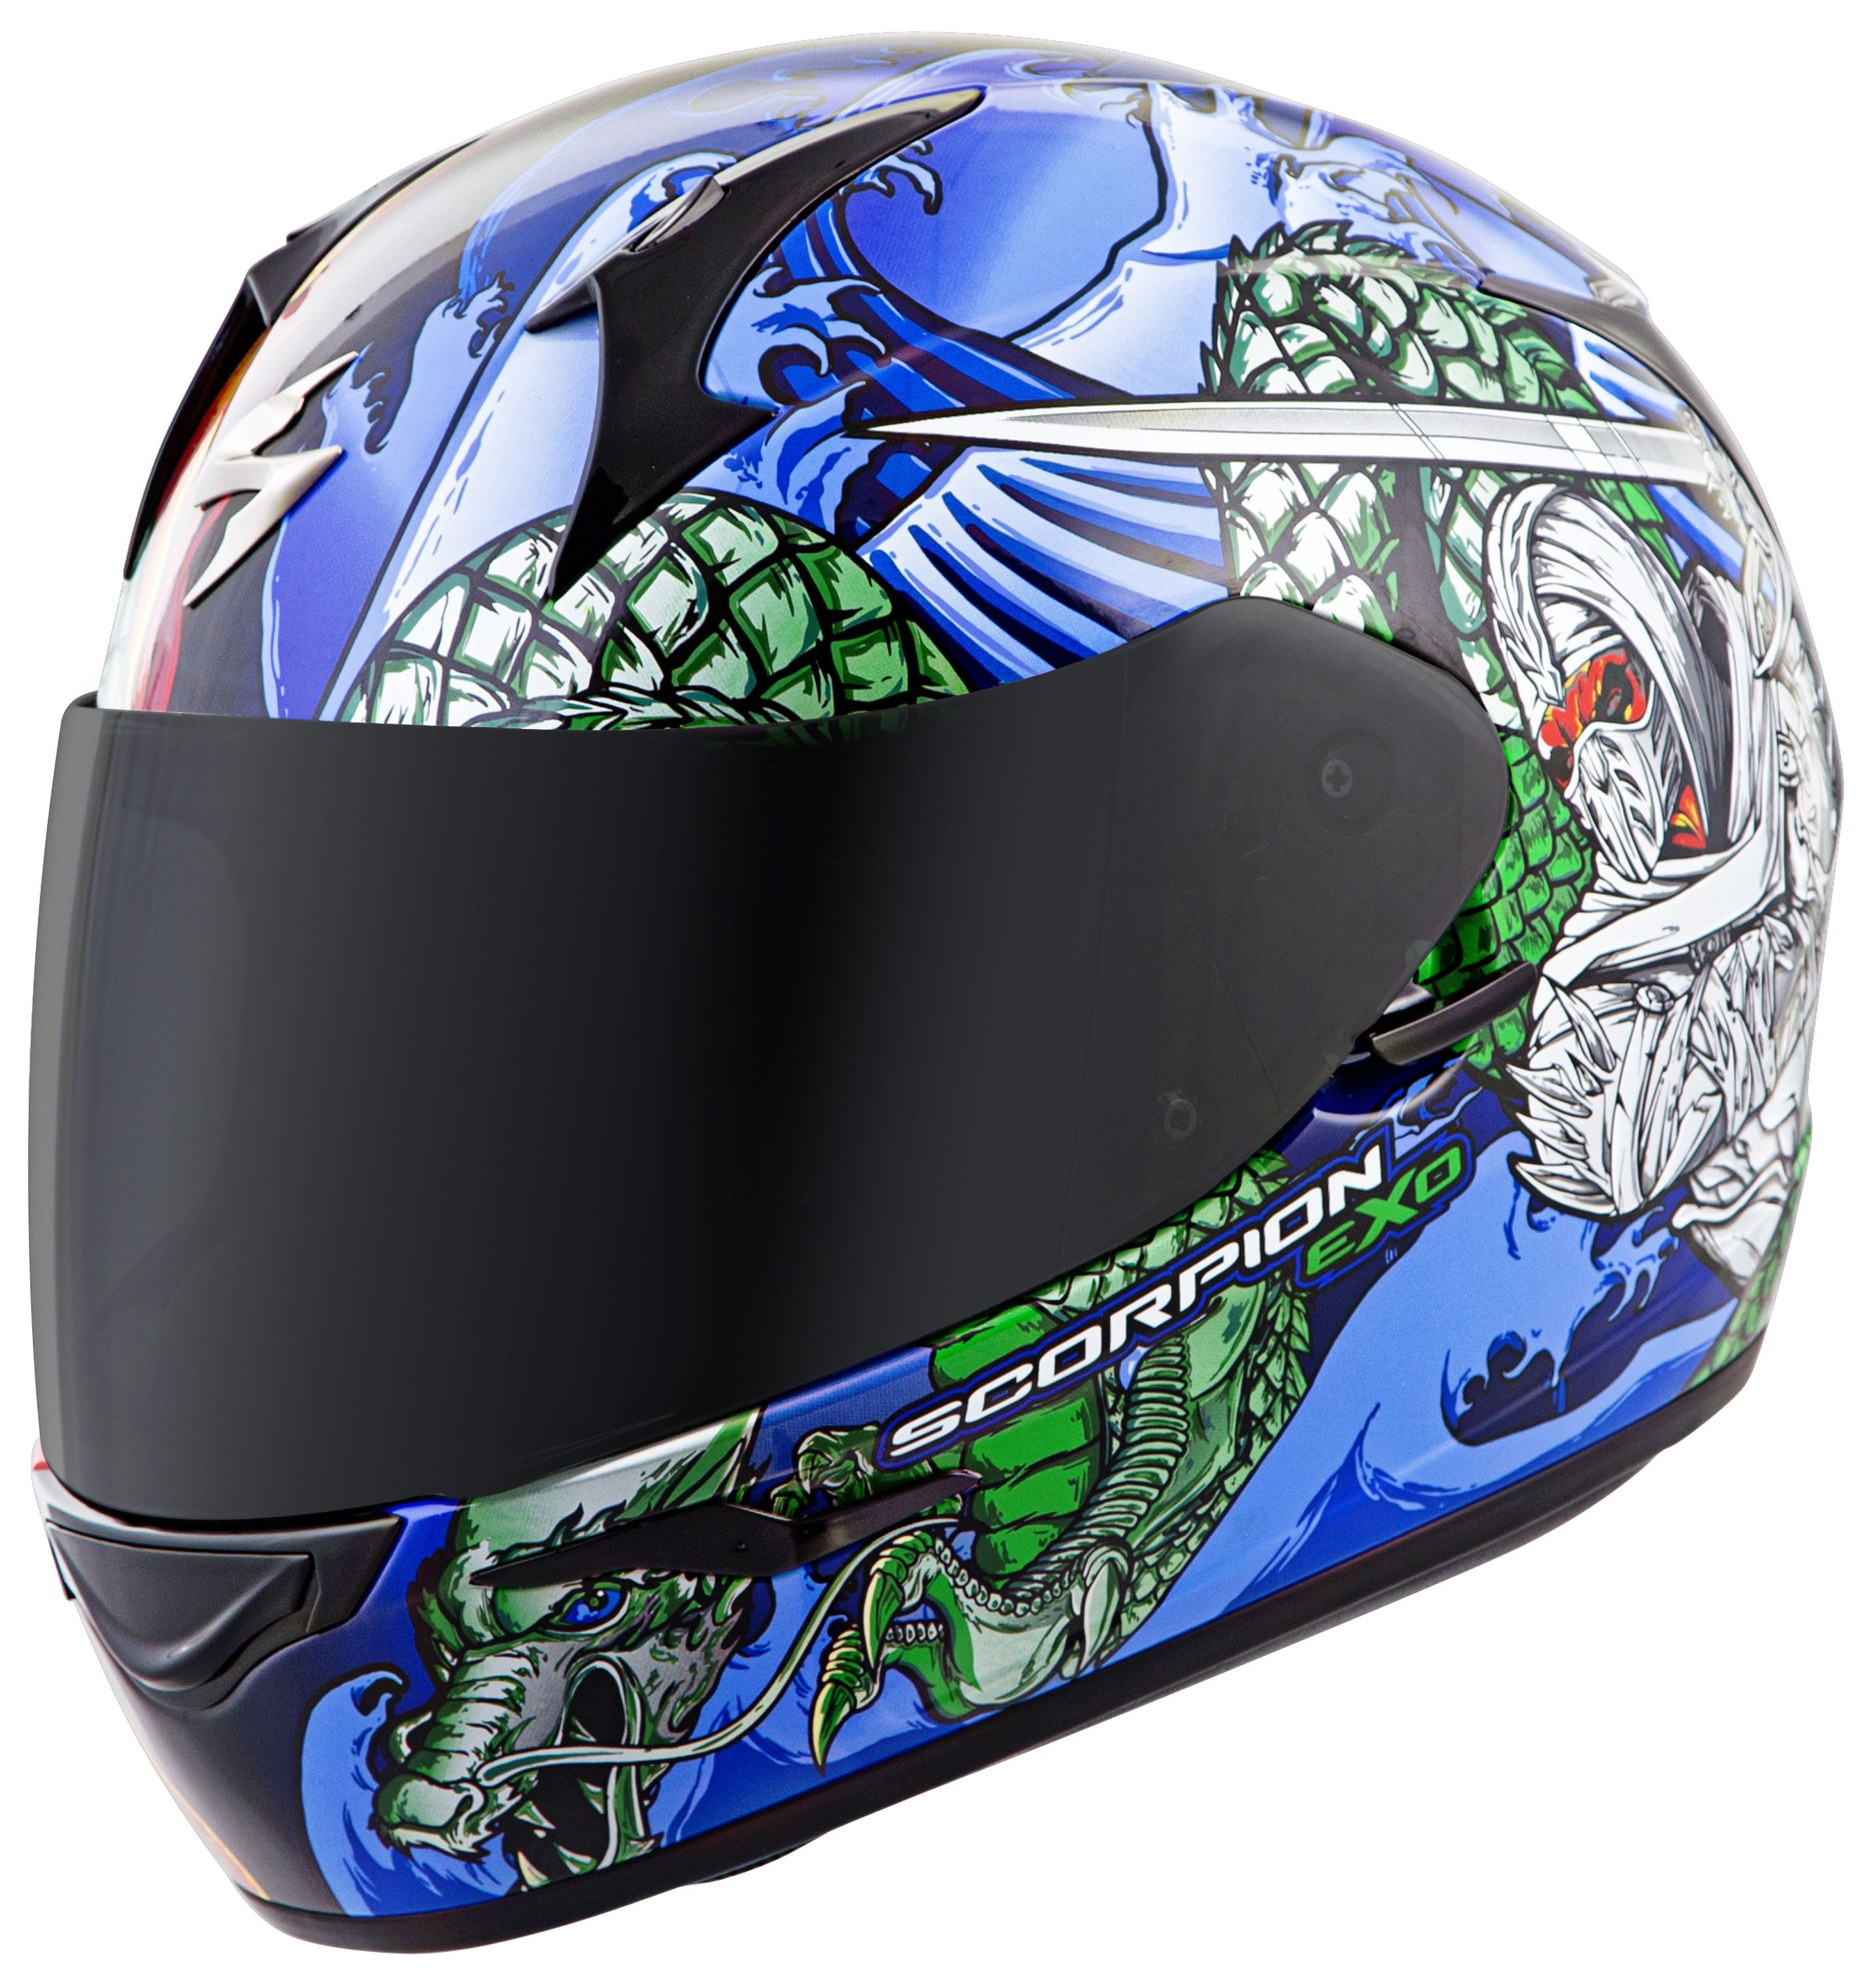 scorpion exo r410 bushido helmet revzilla. Black Bedroom Furniture Sets. Home Design Ideas